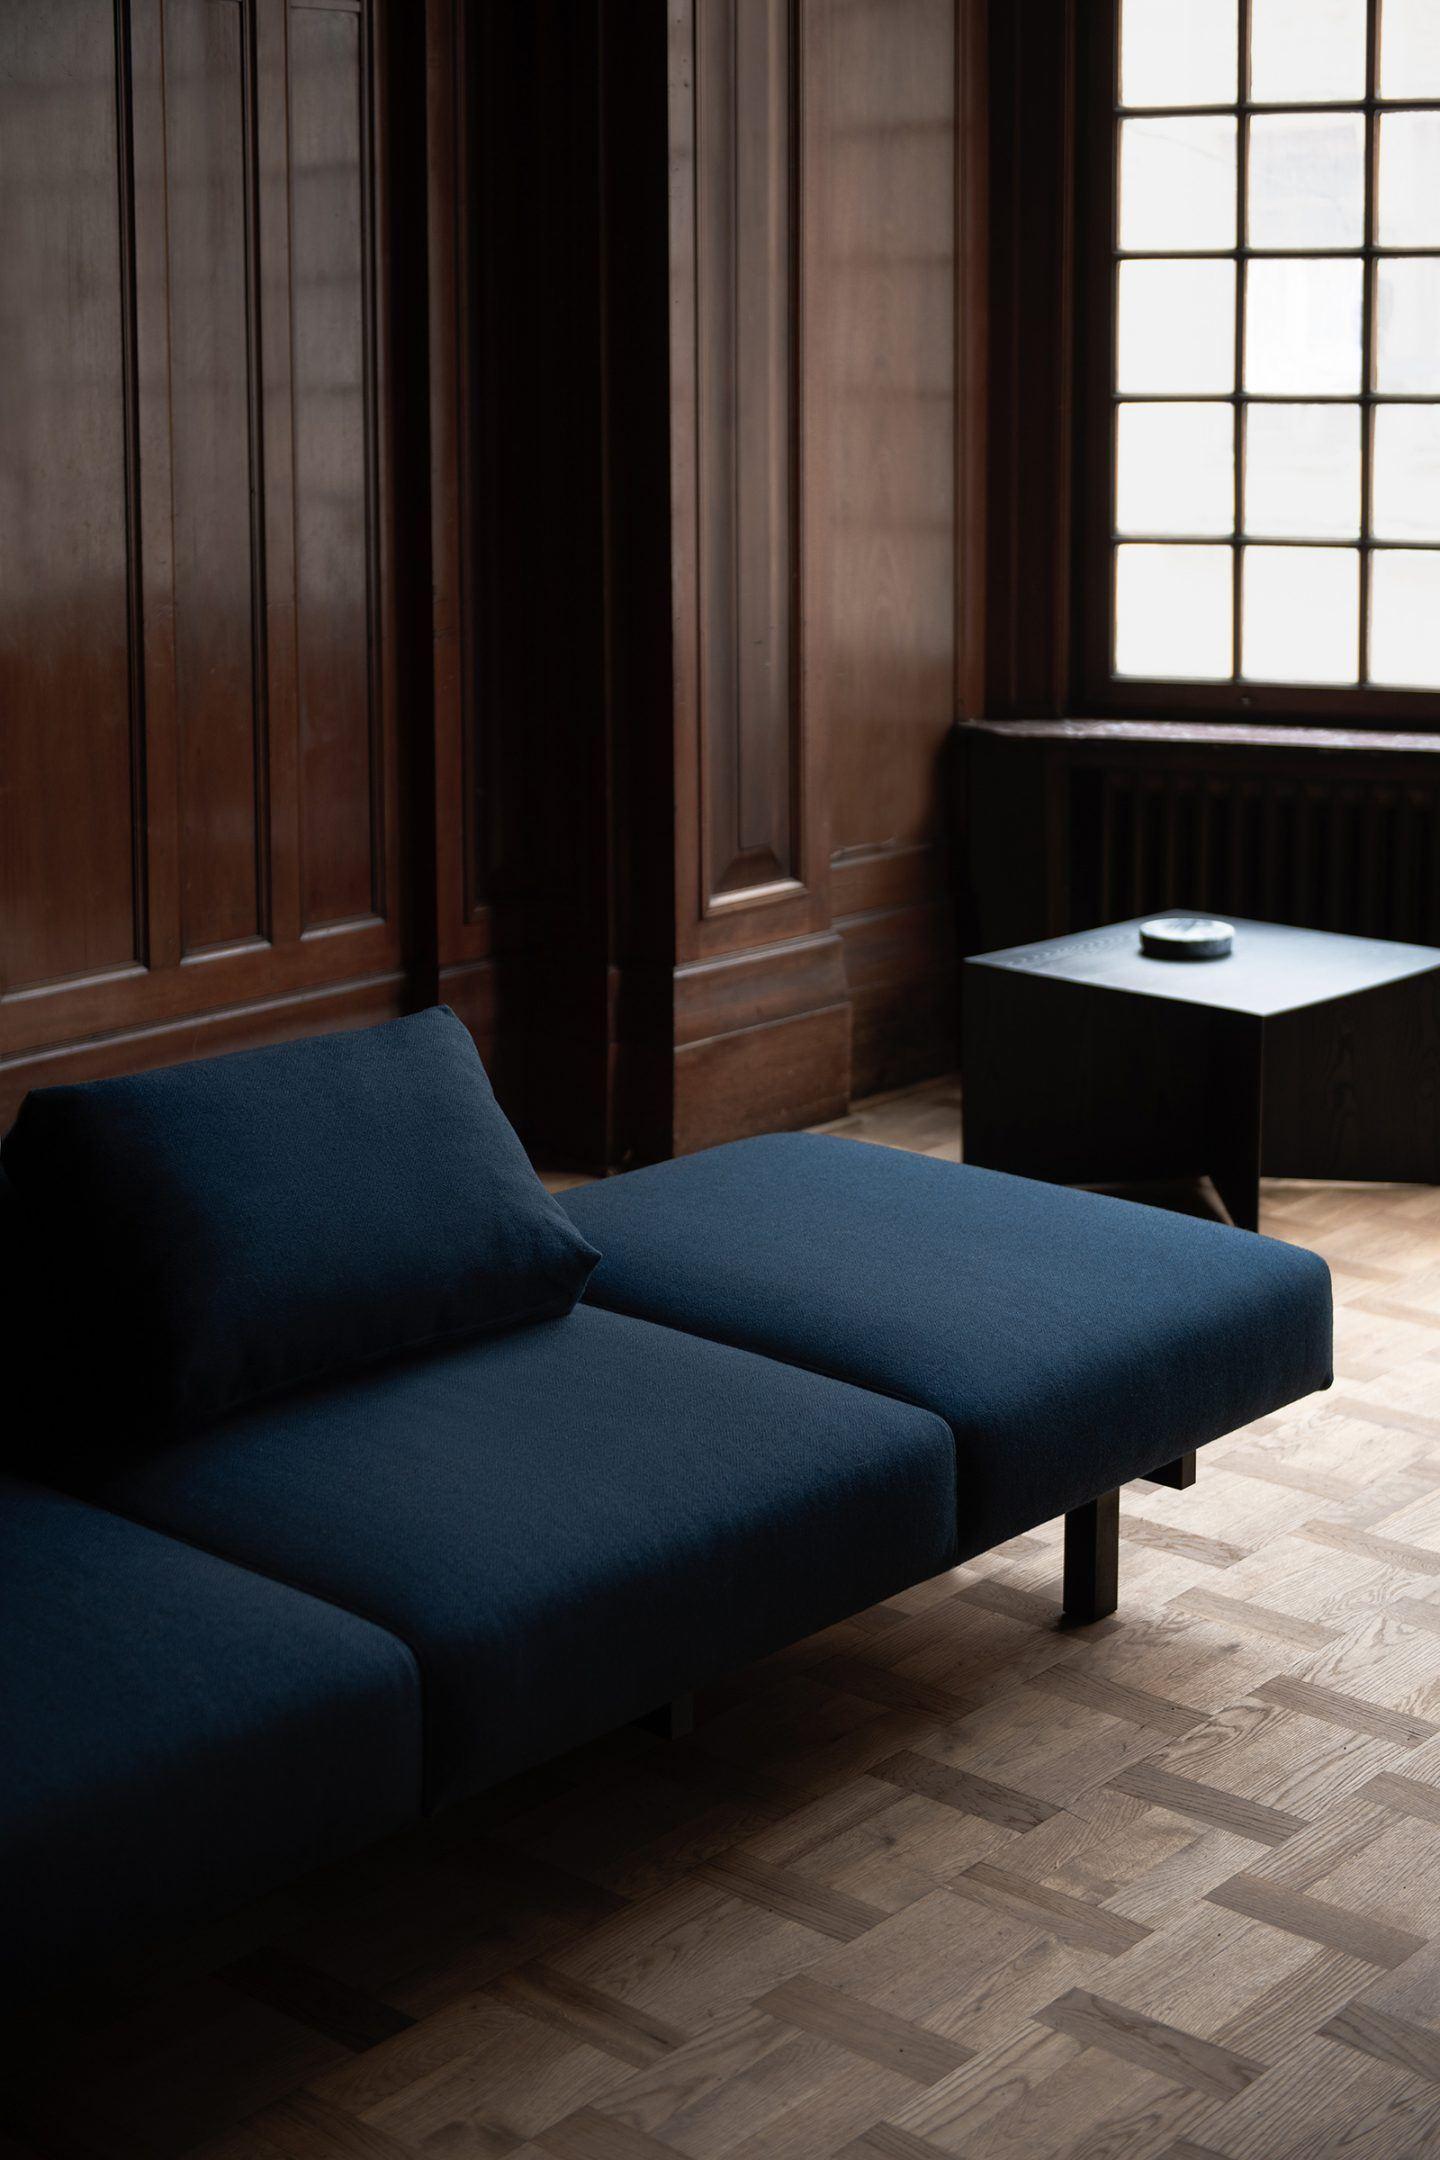 IGNANT-Design-Keiji-Ashizawa-Raft-Sofa-3